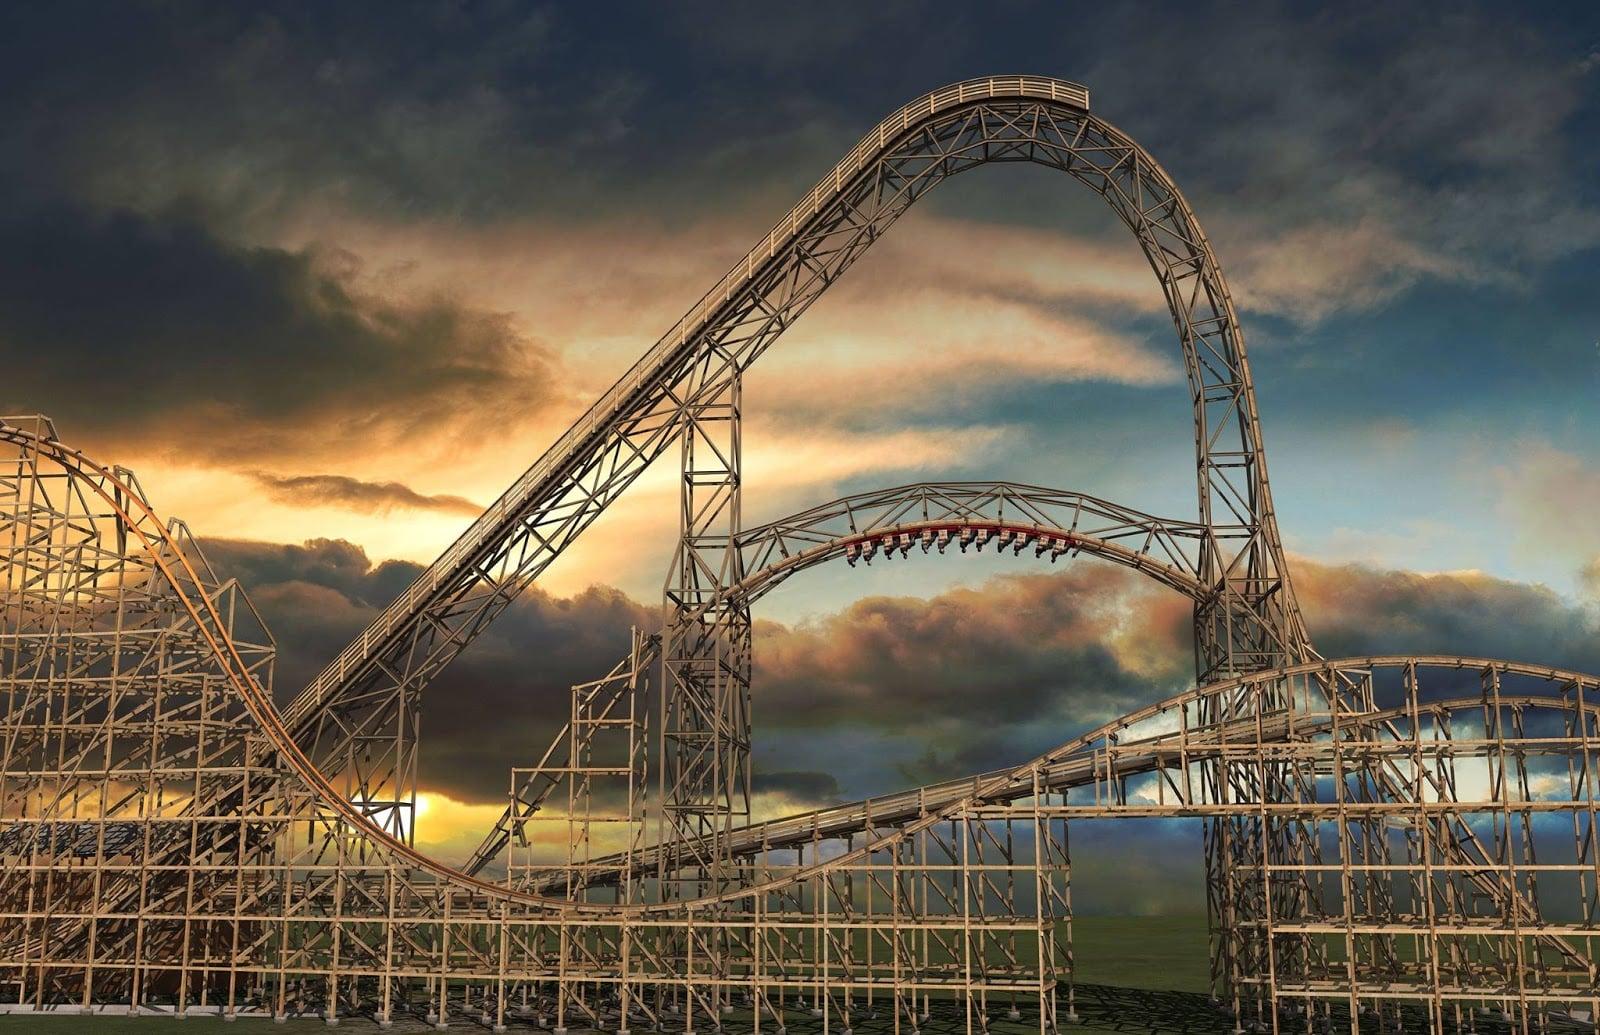 Goliath (Six Flags Great America, Gurnee, IL)